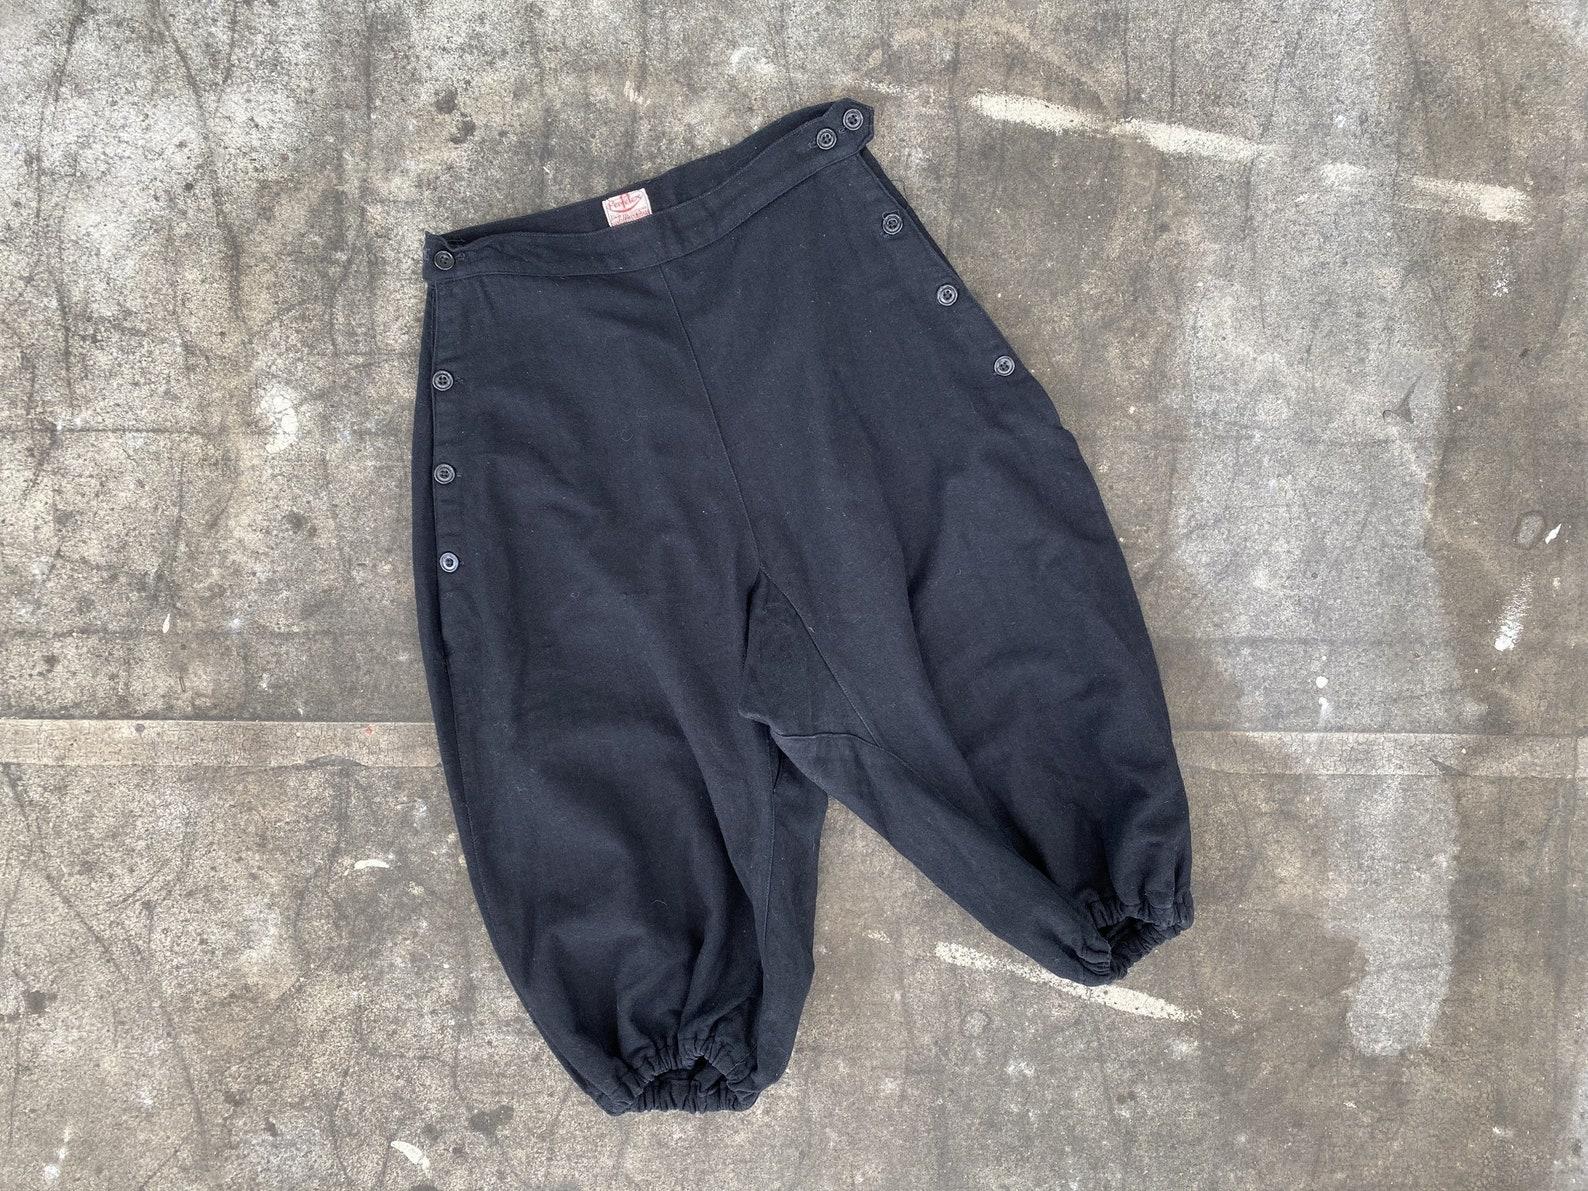 1920s Black Athletic Pants Bloomers